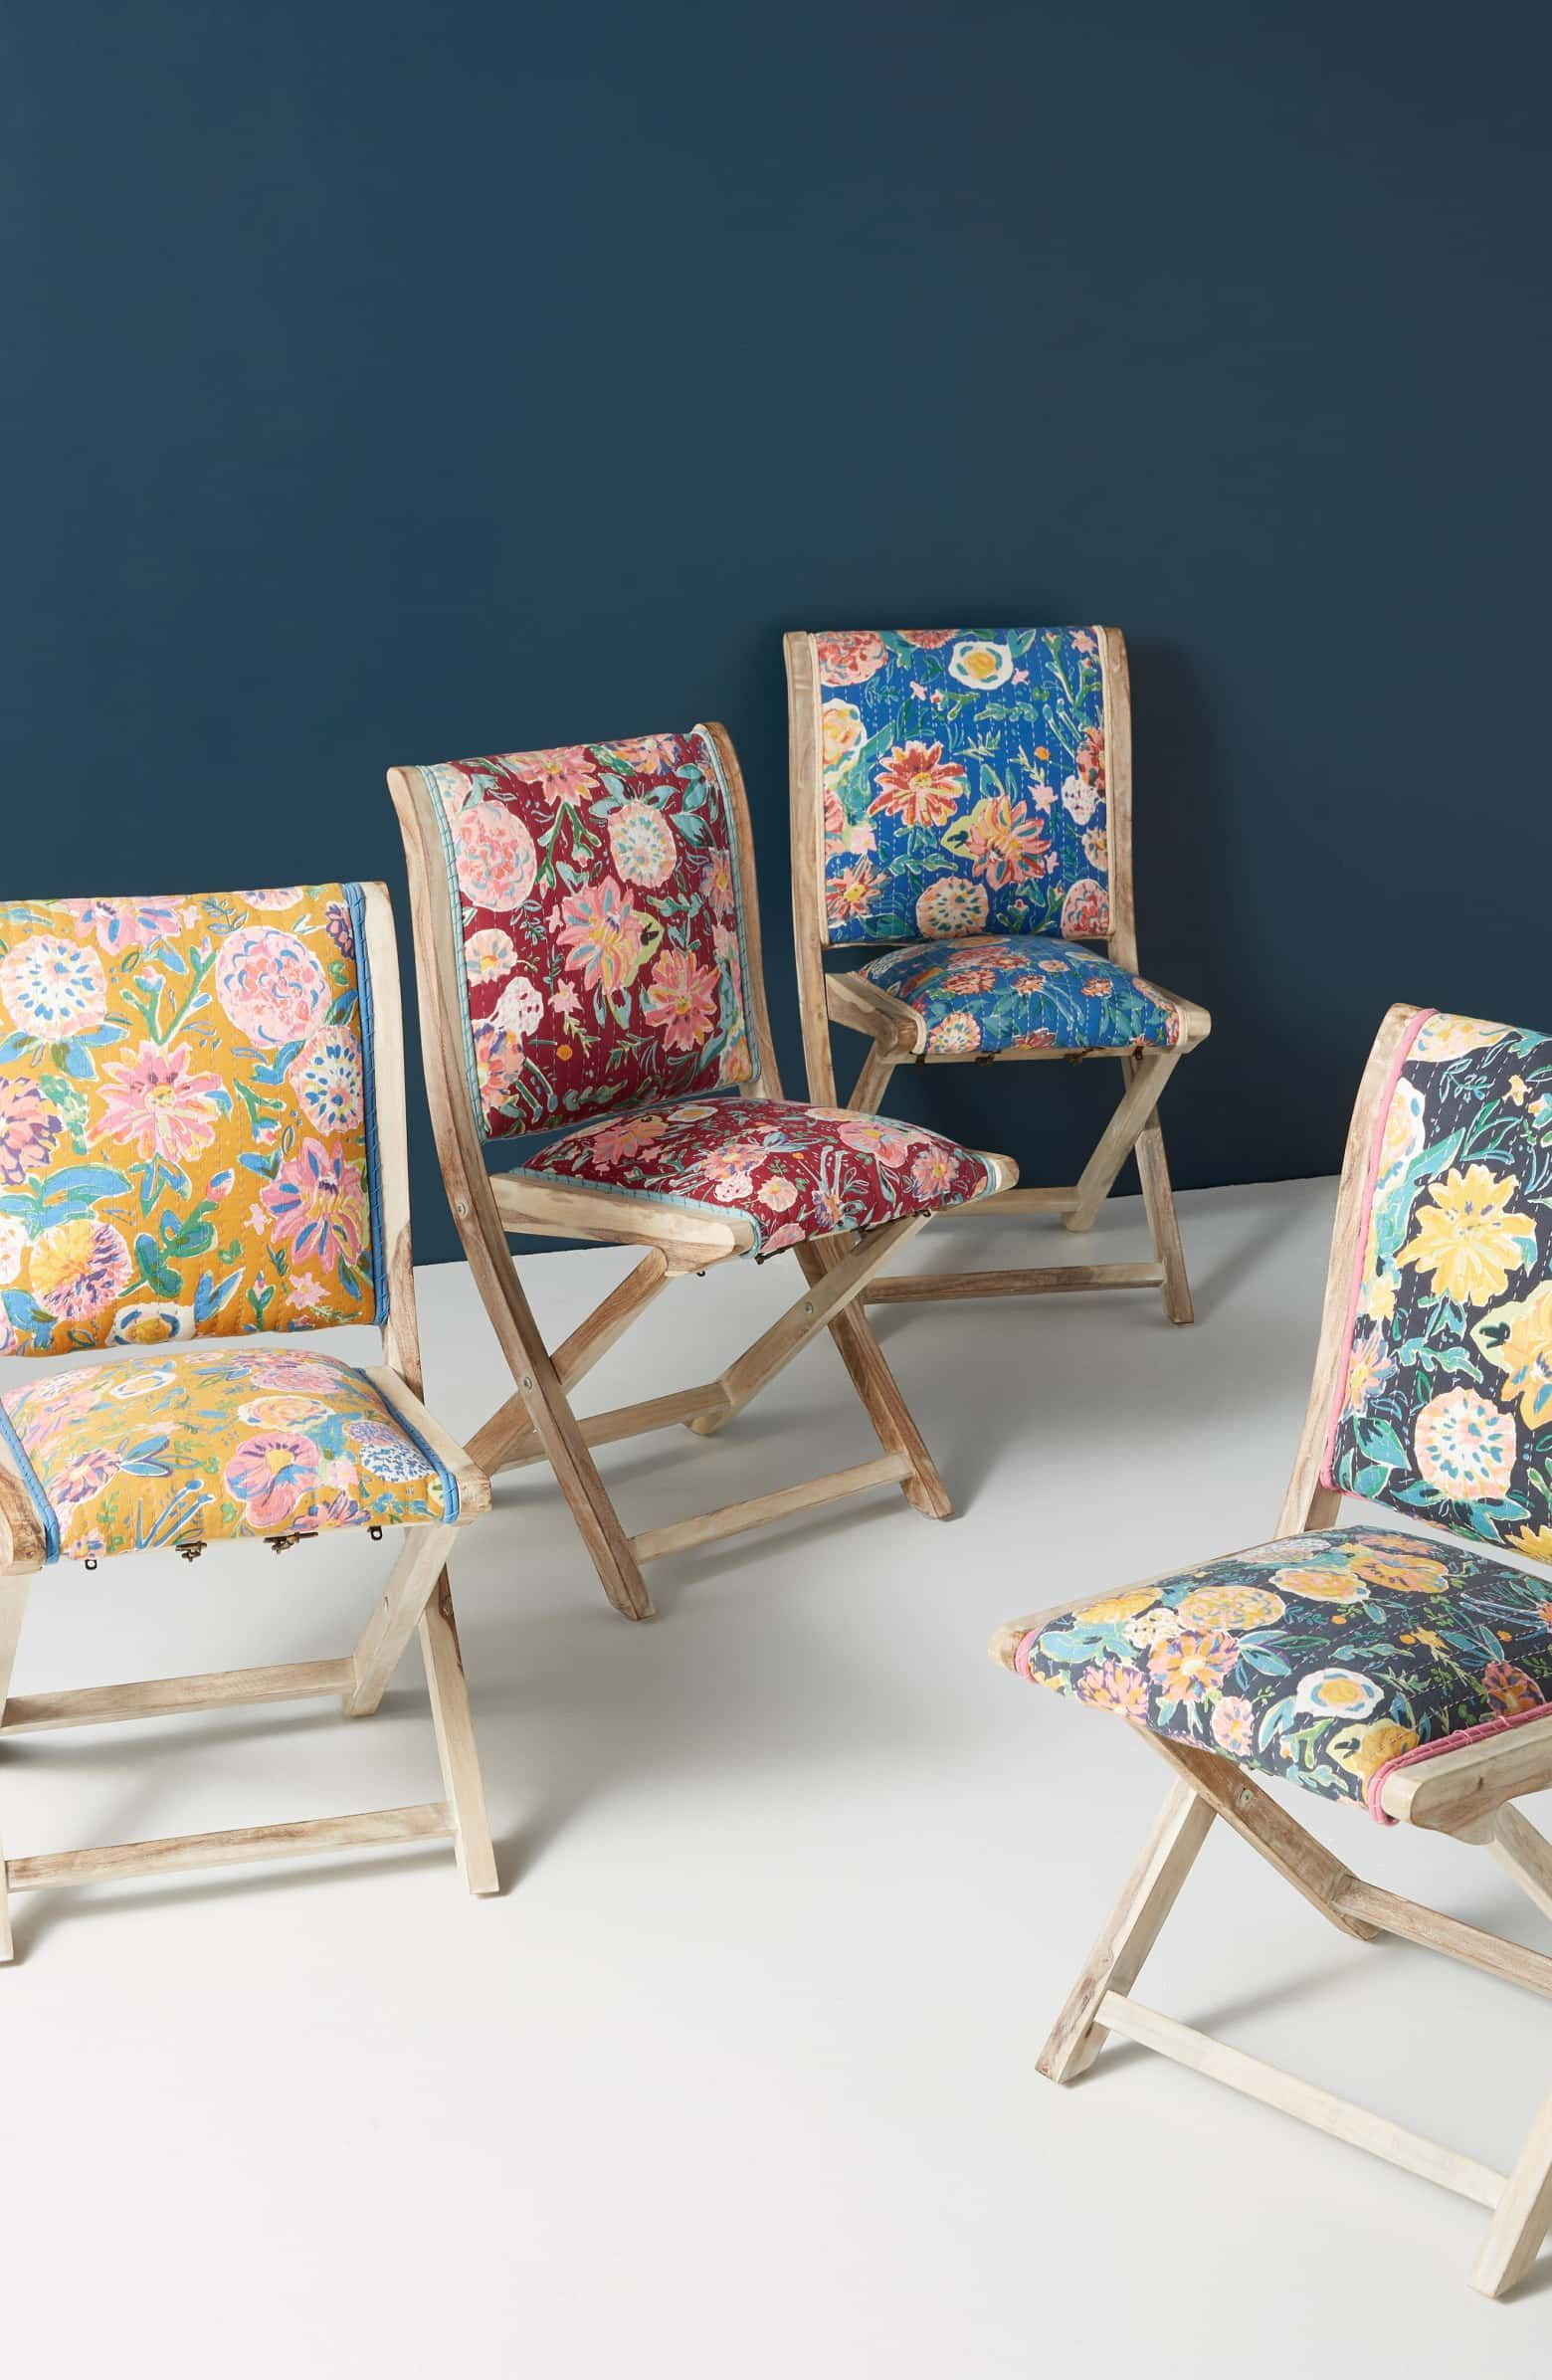 Anthropologie Emma Terai Folding Chair Folding chair